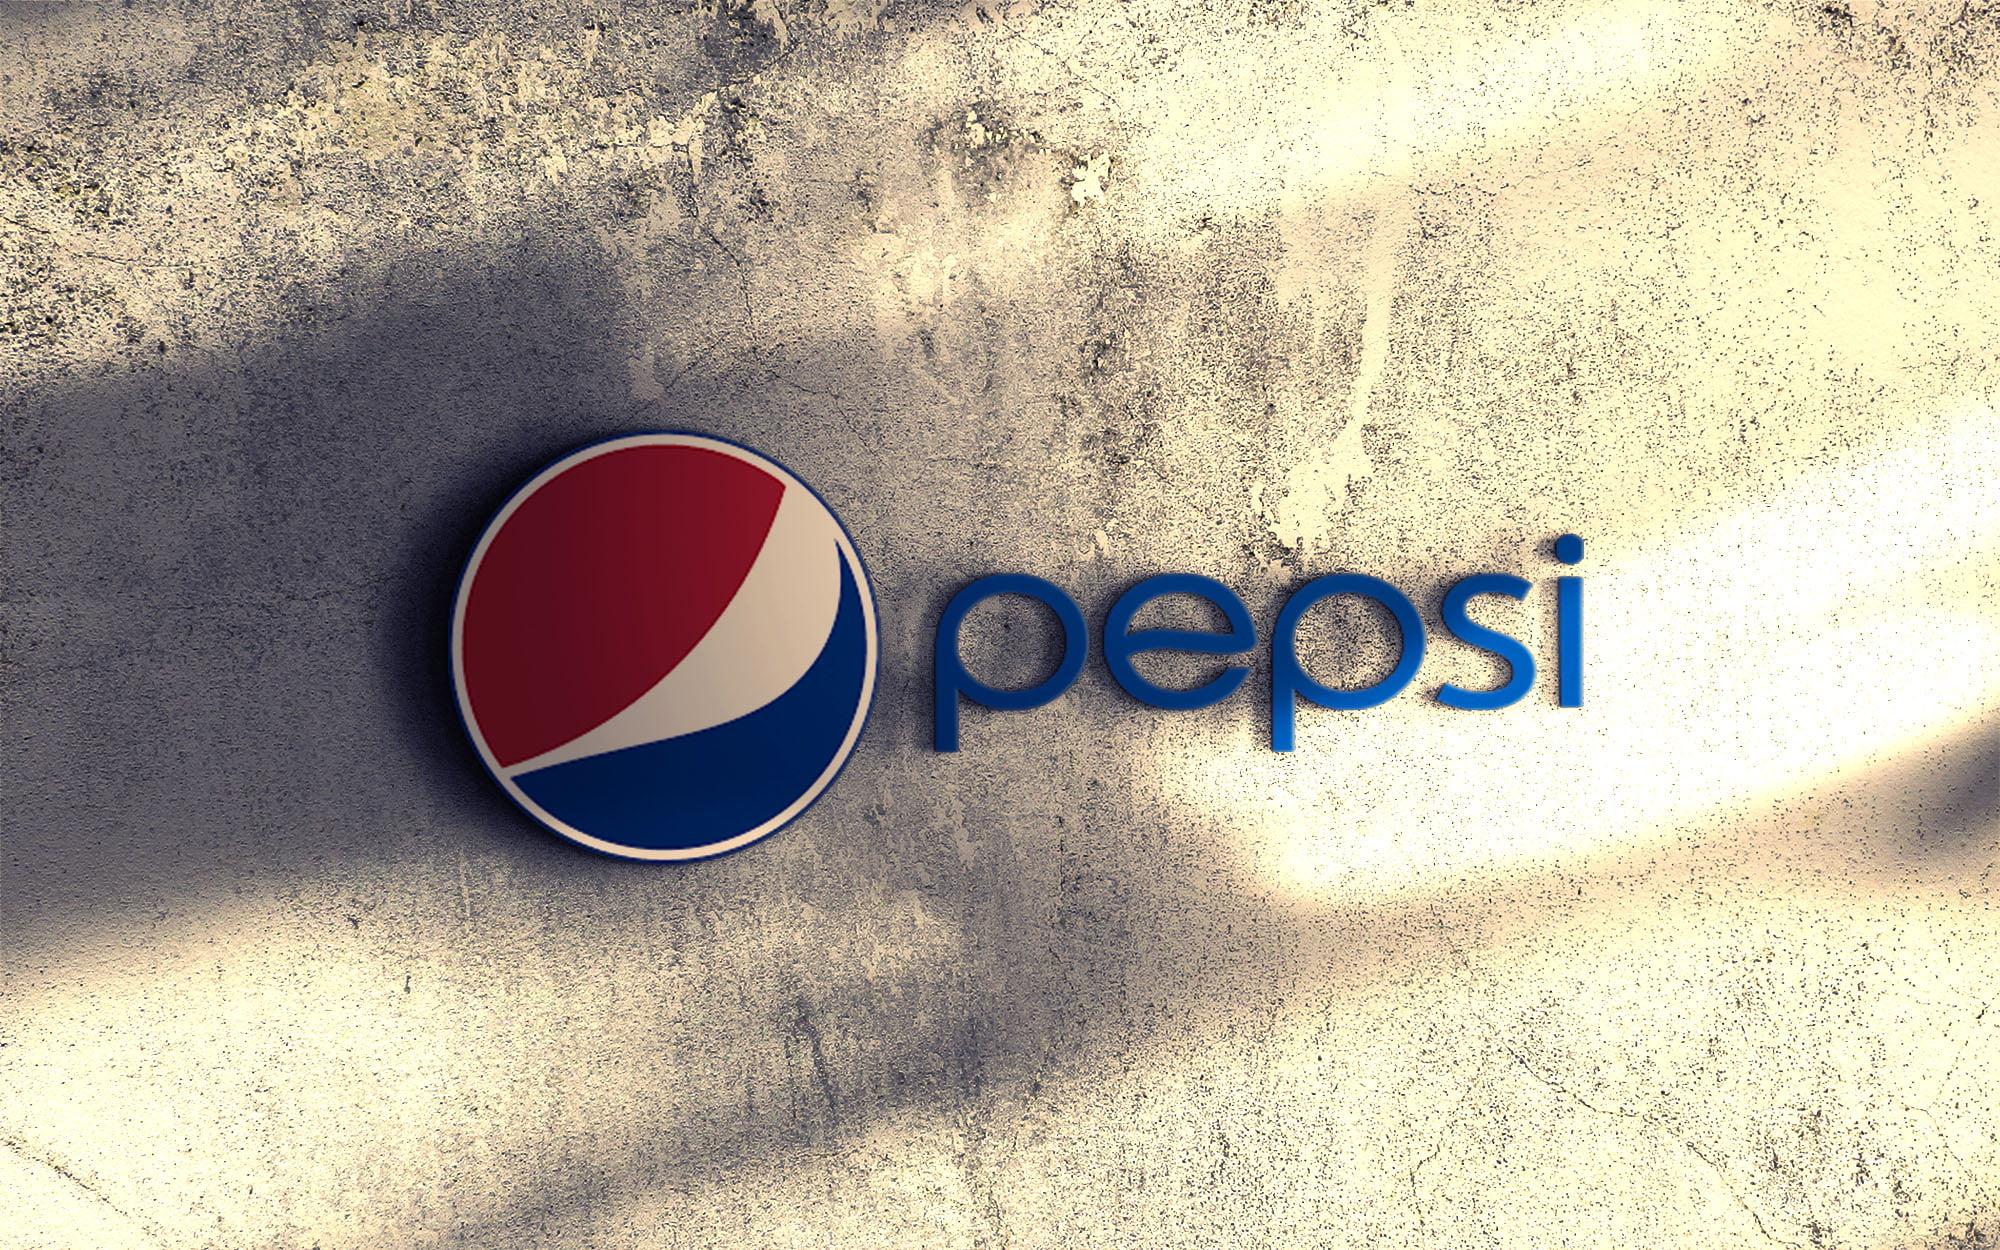 Pepsi on 3d wall logo mockup free